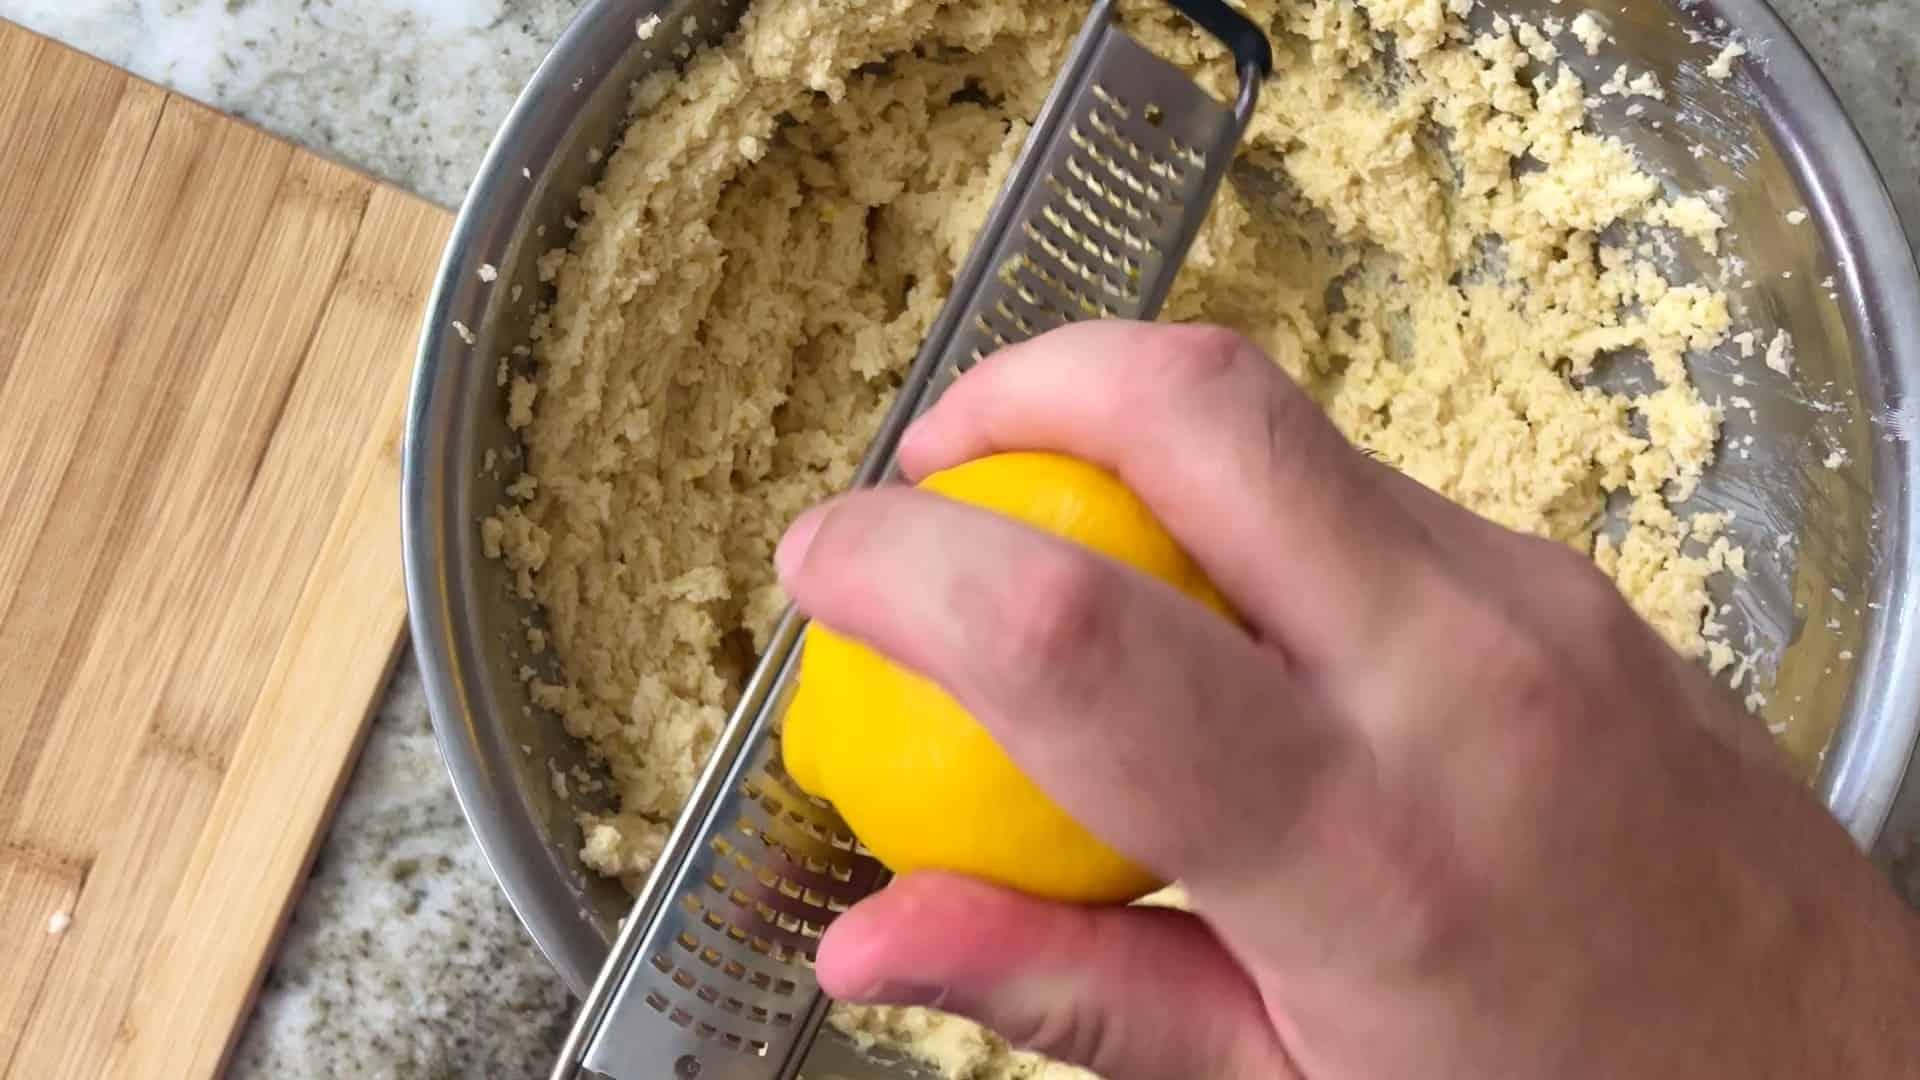 zesting a lemon into the cake batter